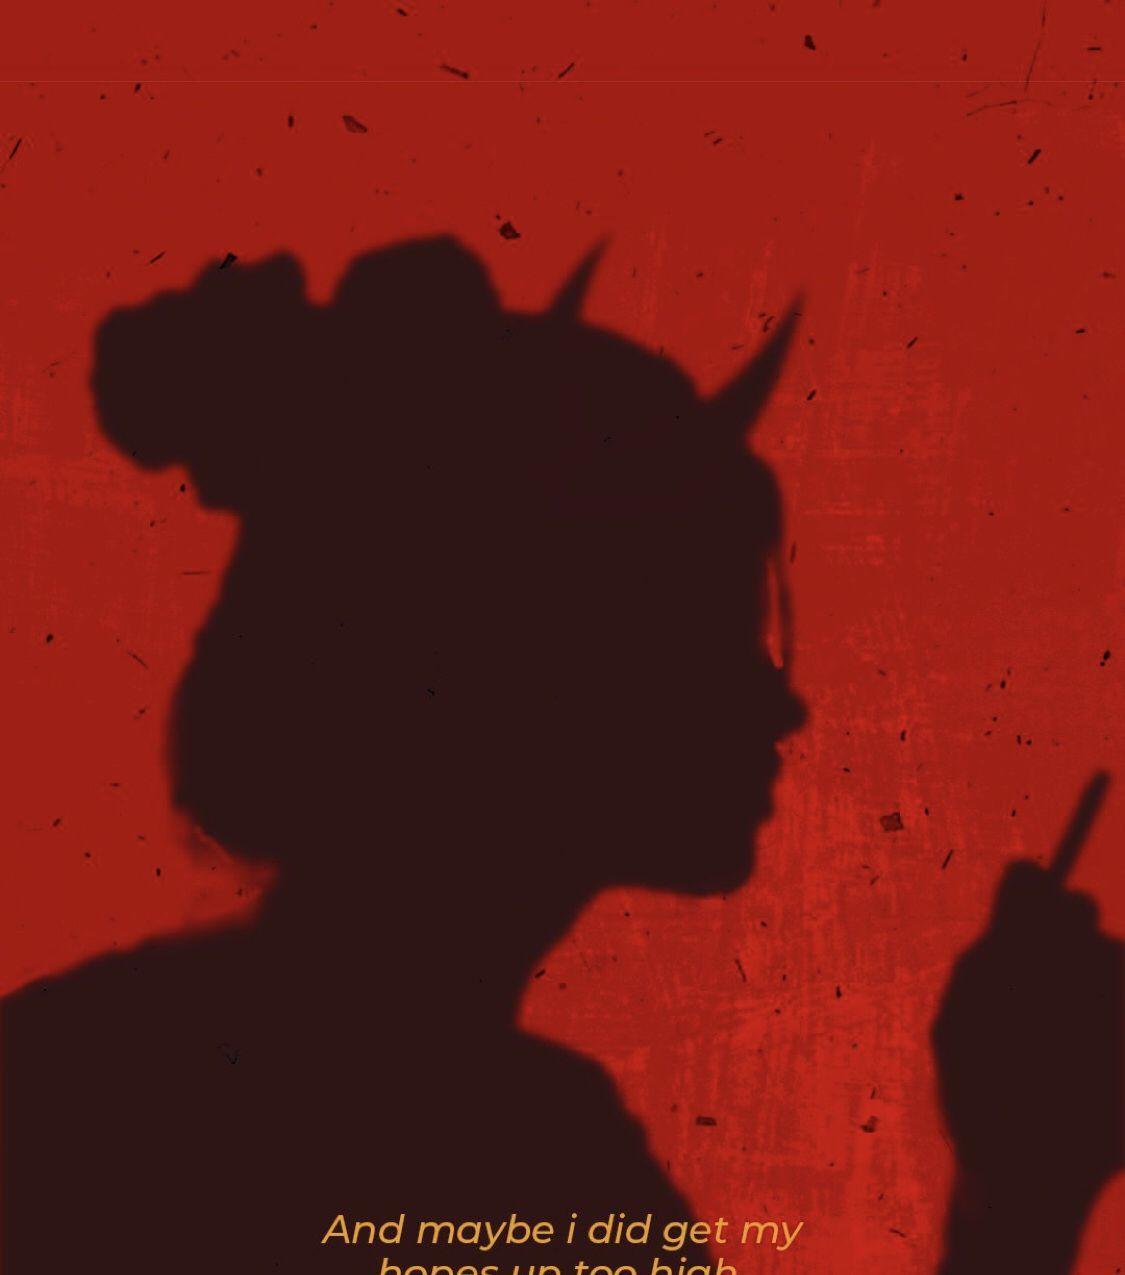 Devil Aesthetic Wallpapers - Wallpaper Cave